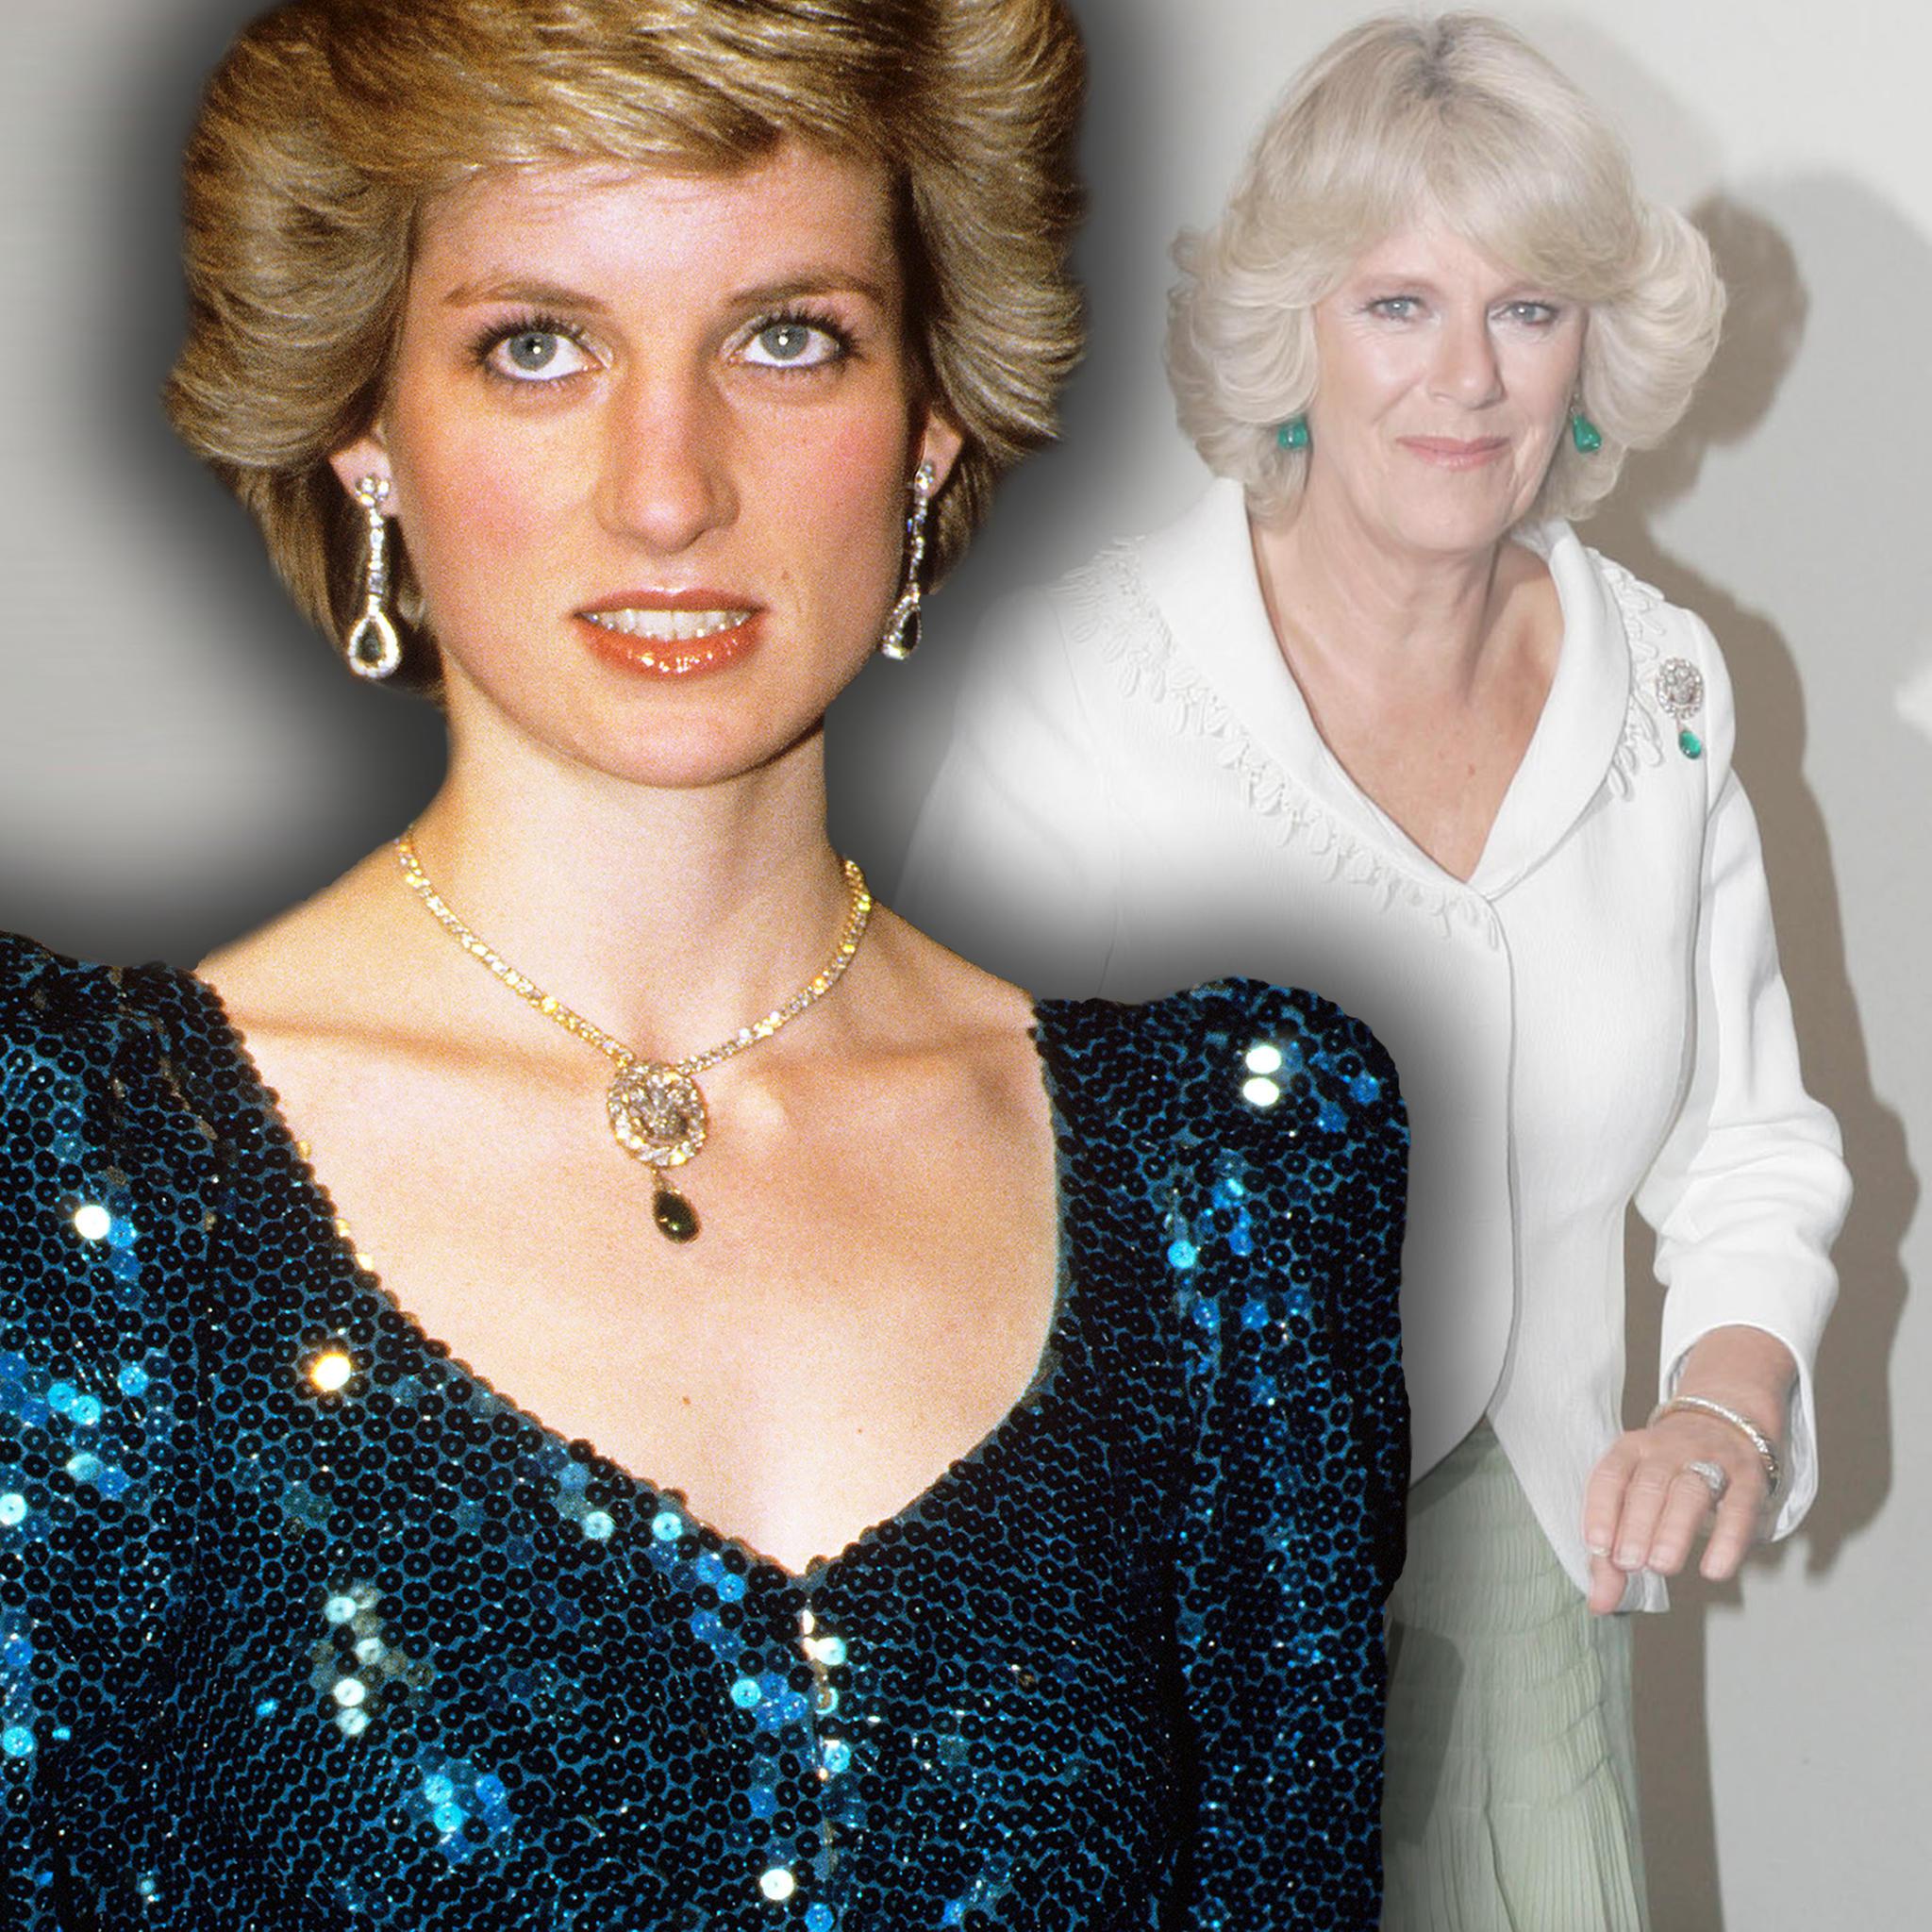 Lady Diana und Herzogin Camilla